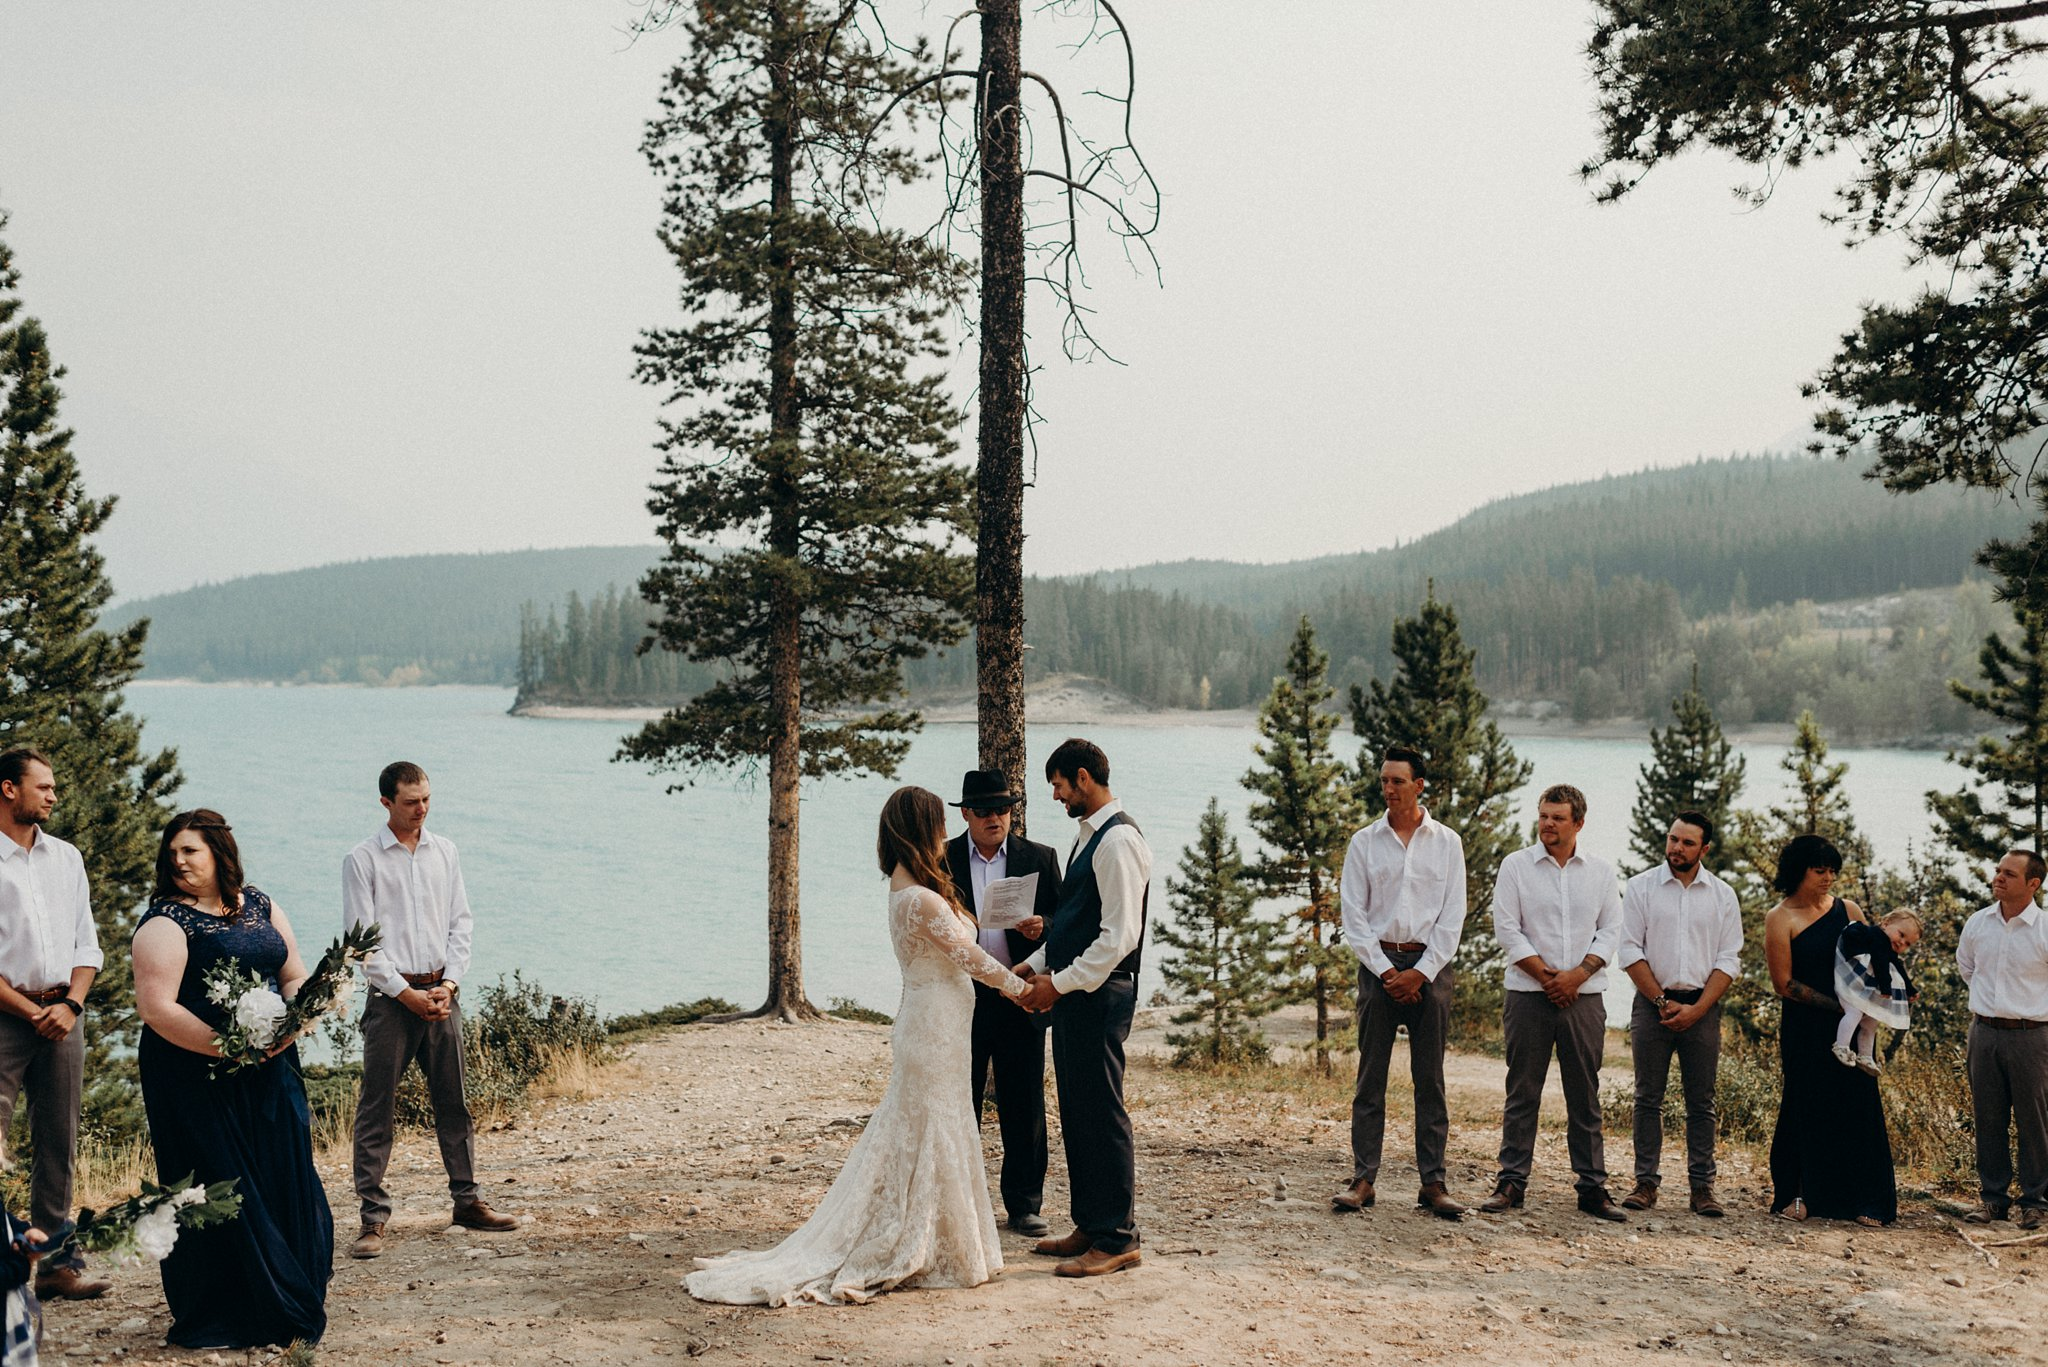 kaihla_tonai_intimate_wedding_elopement_photographer_6722.jpg